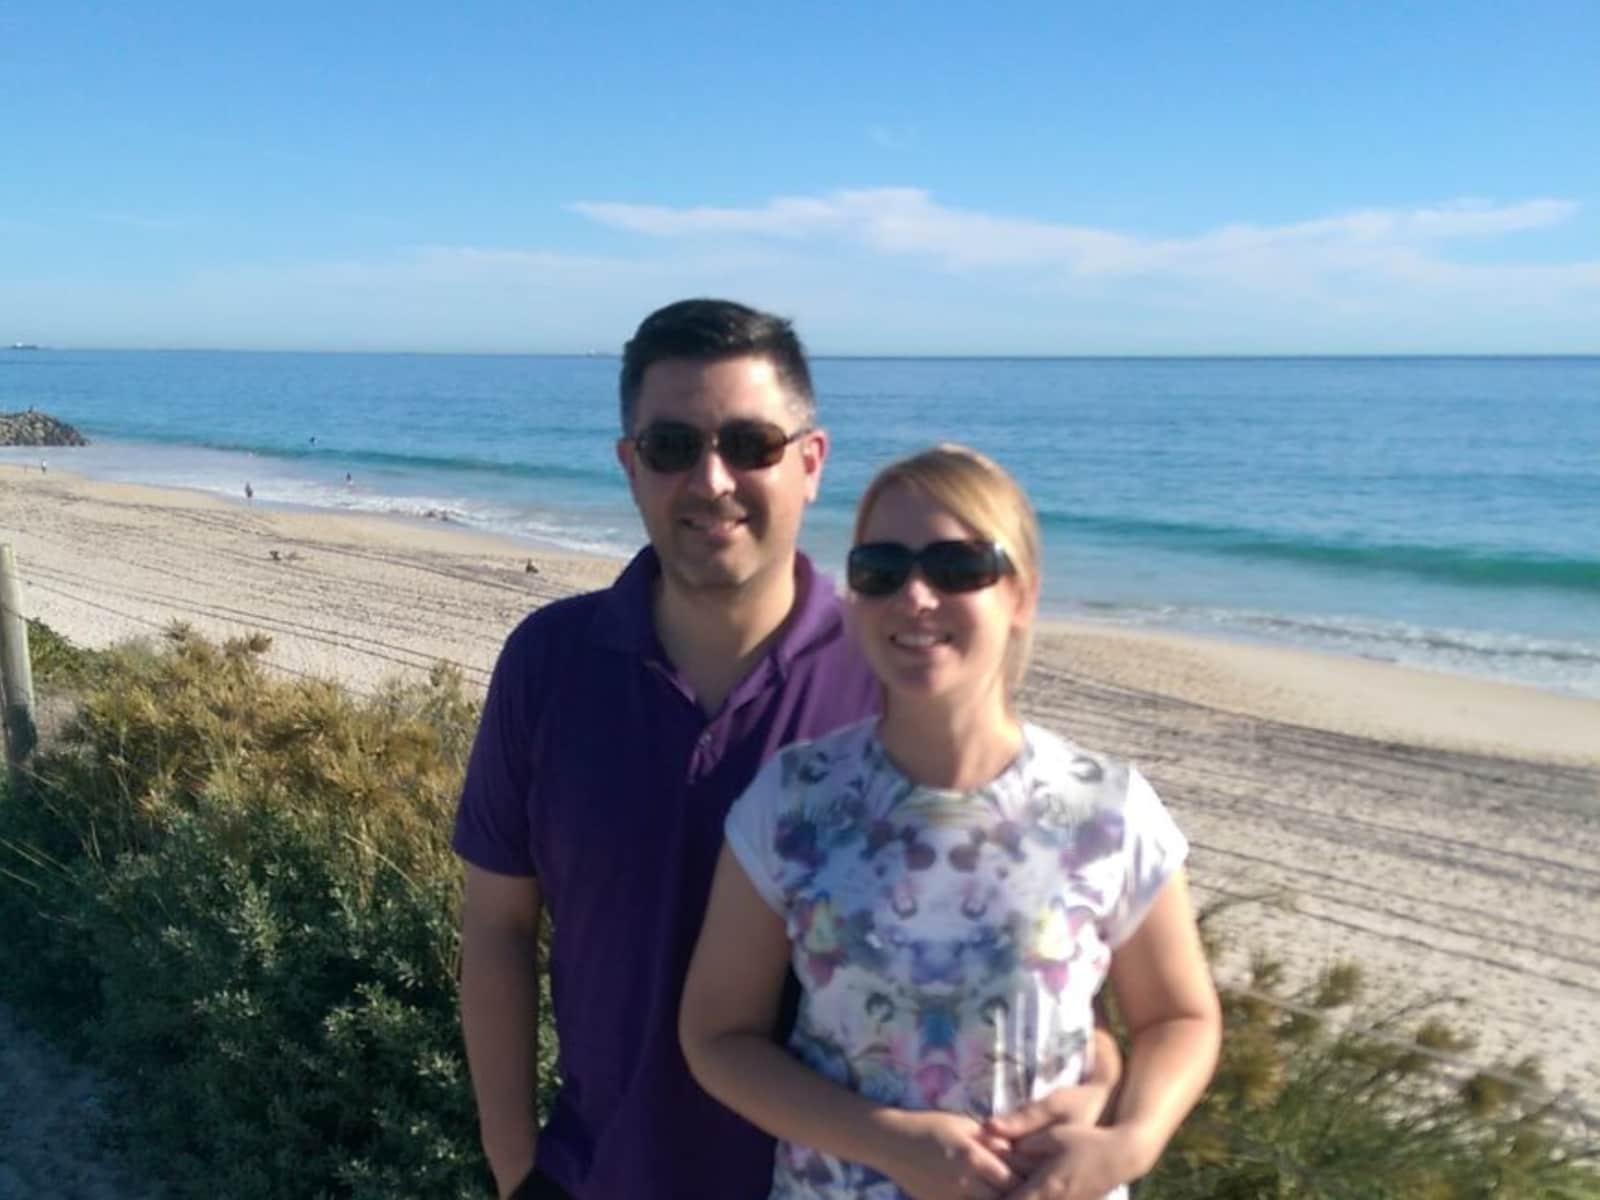 Stuart & Dianne from Melbourne, Victoria, Australia